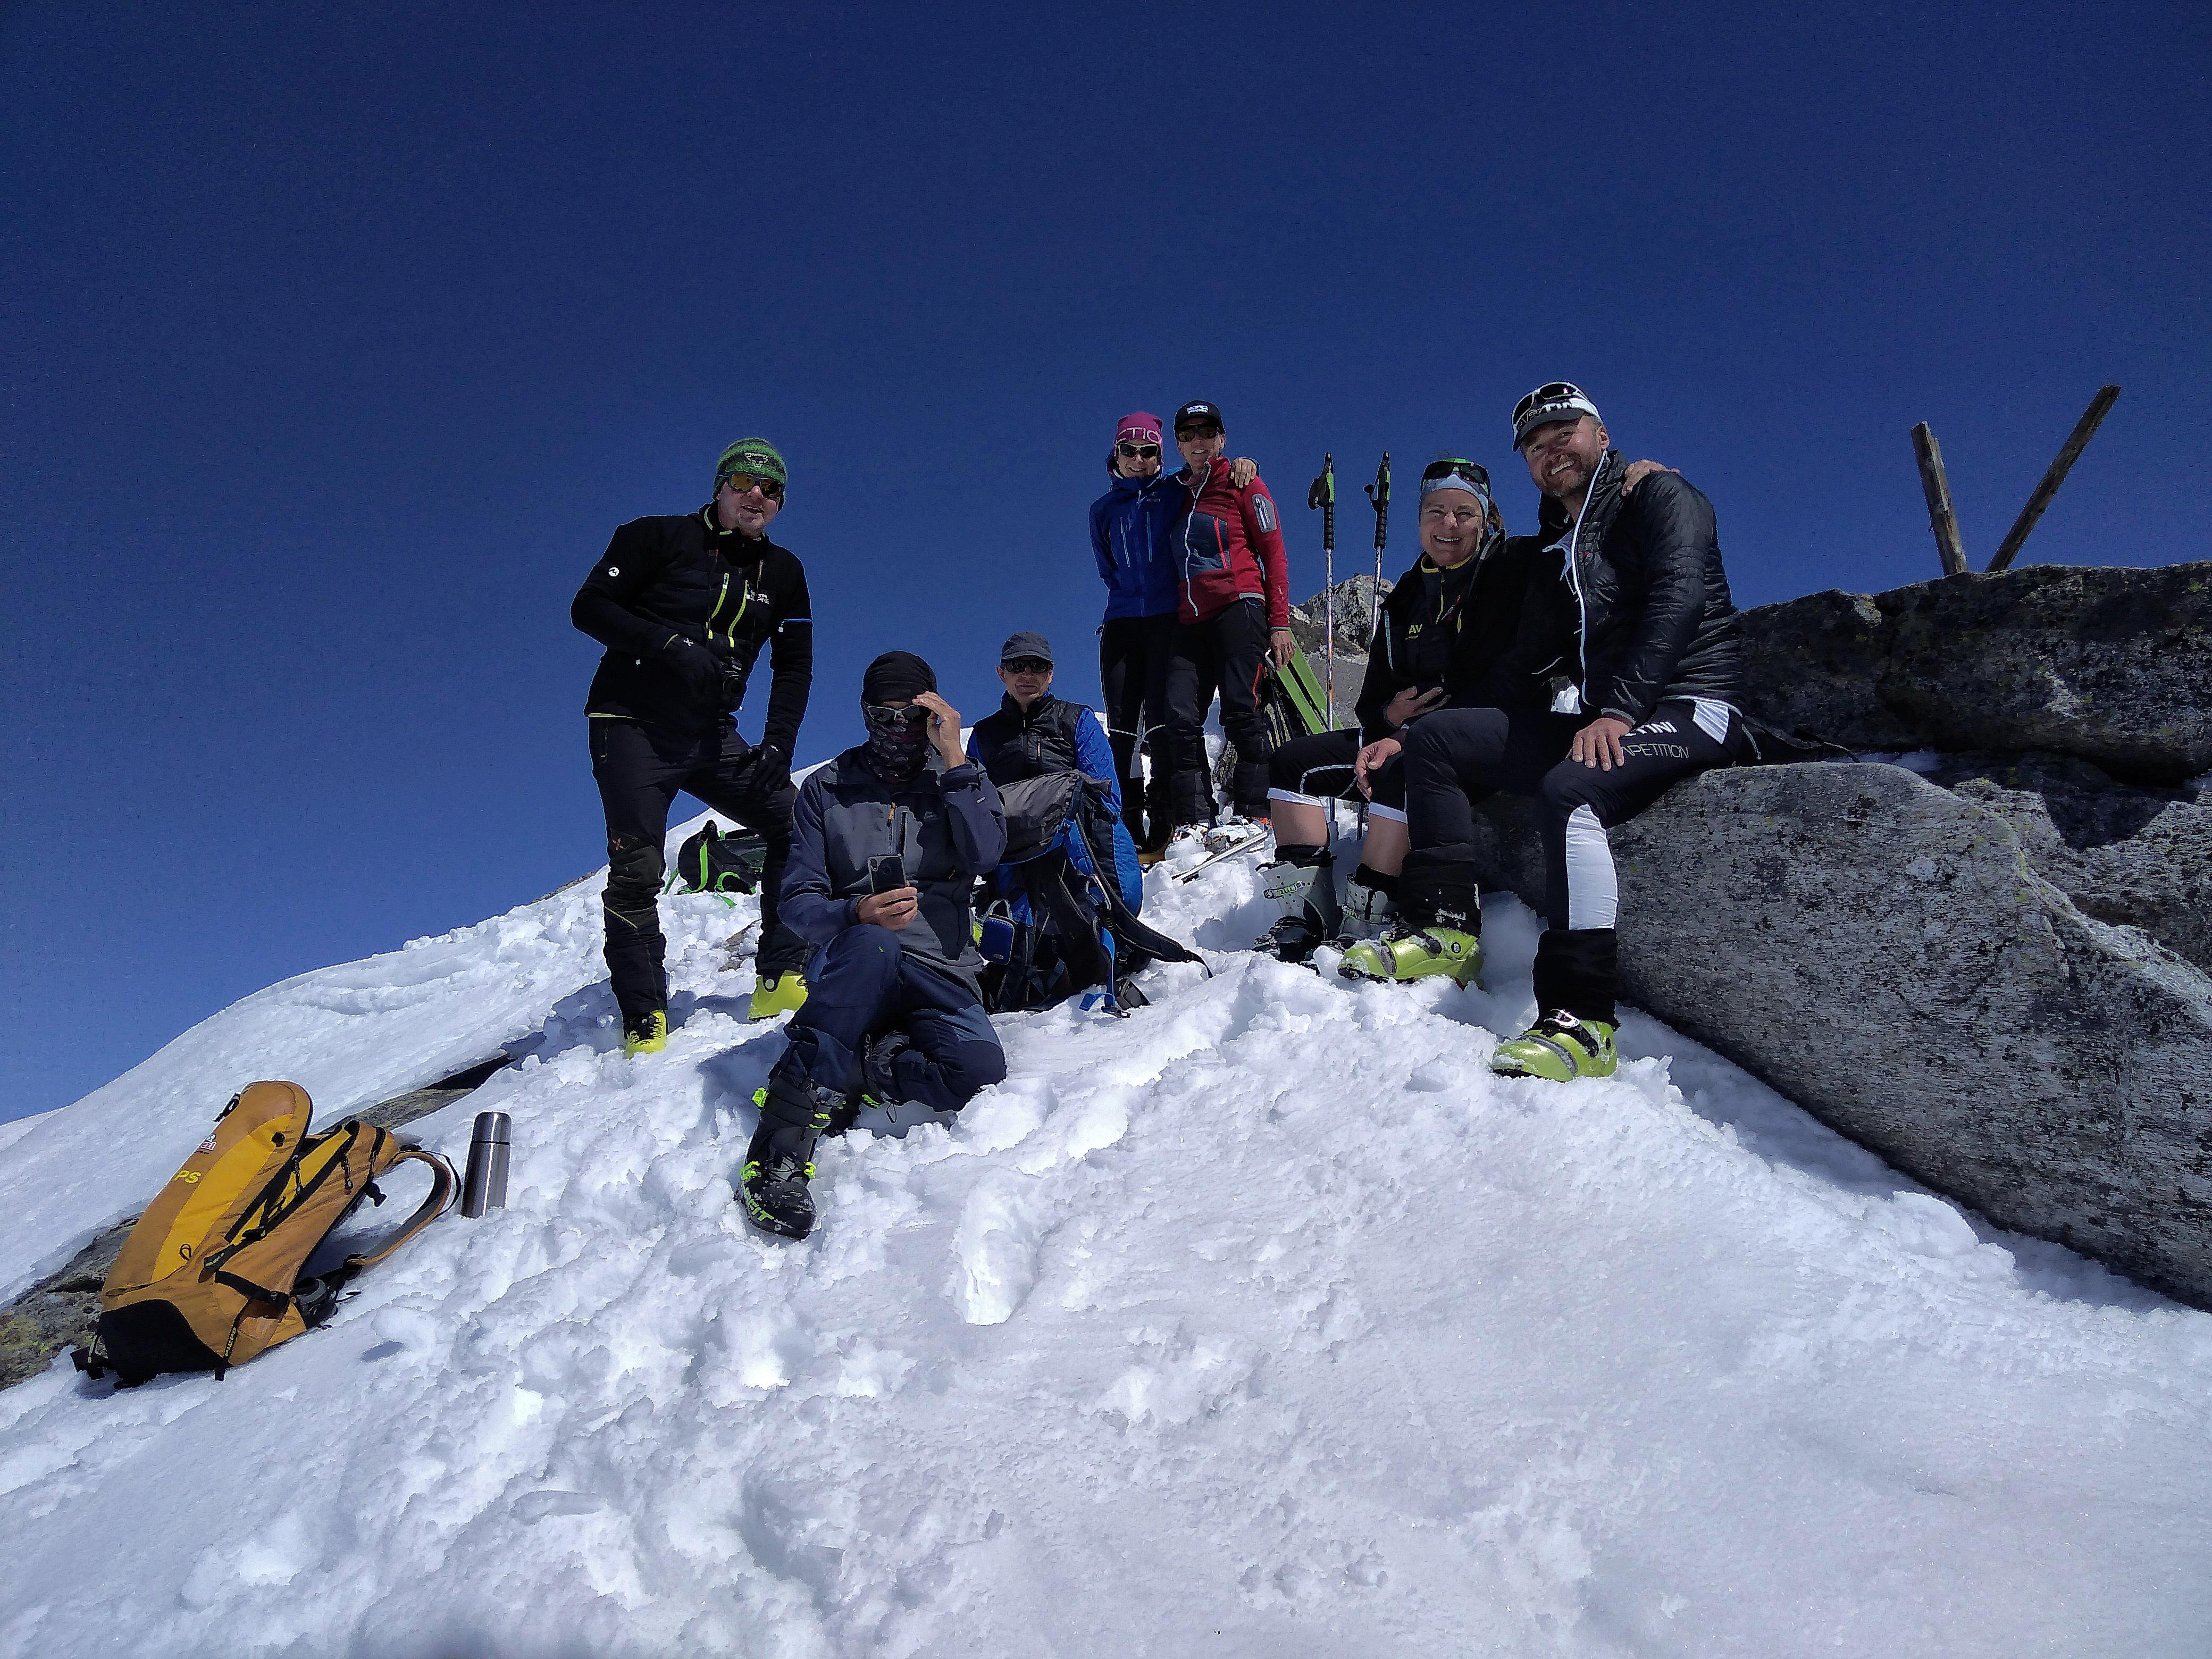 Skitour Krimmler Tauern auf den Klockerkarkopf am 20.04.2019